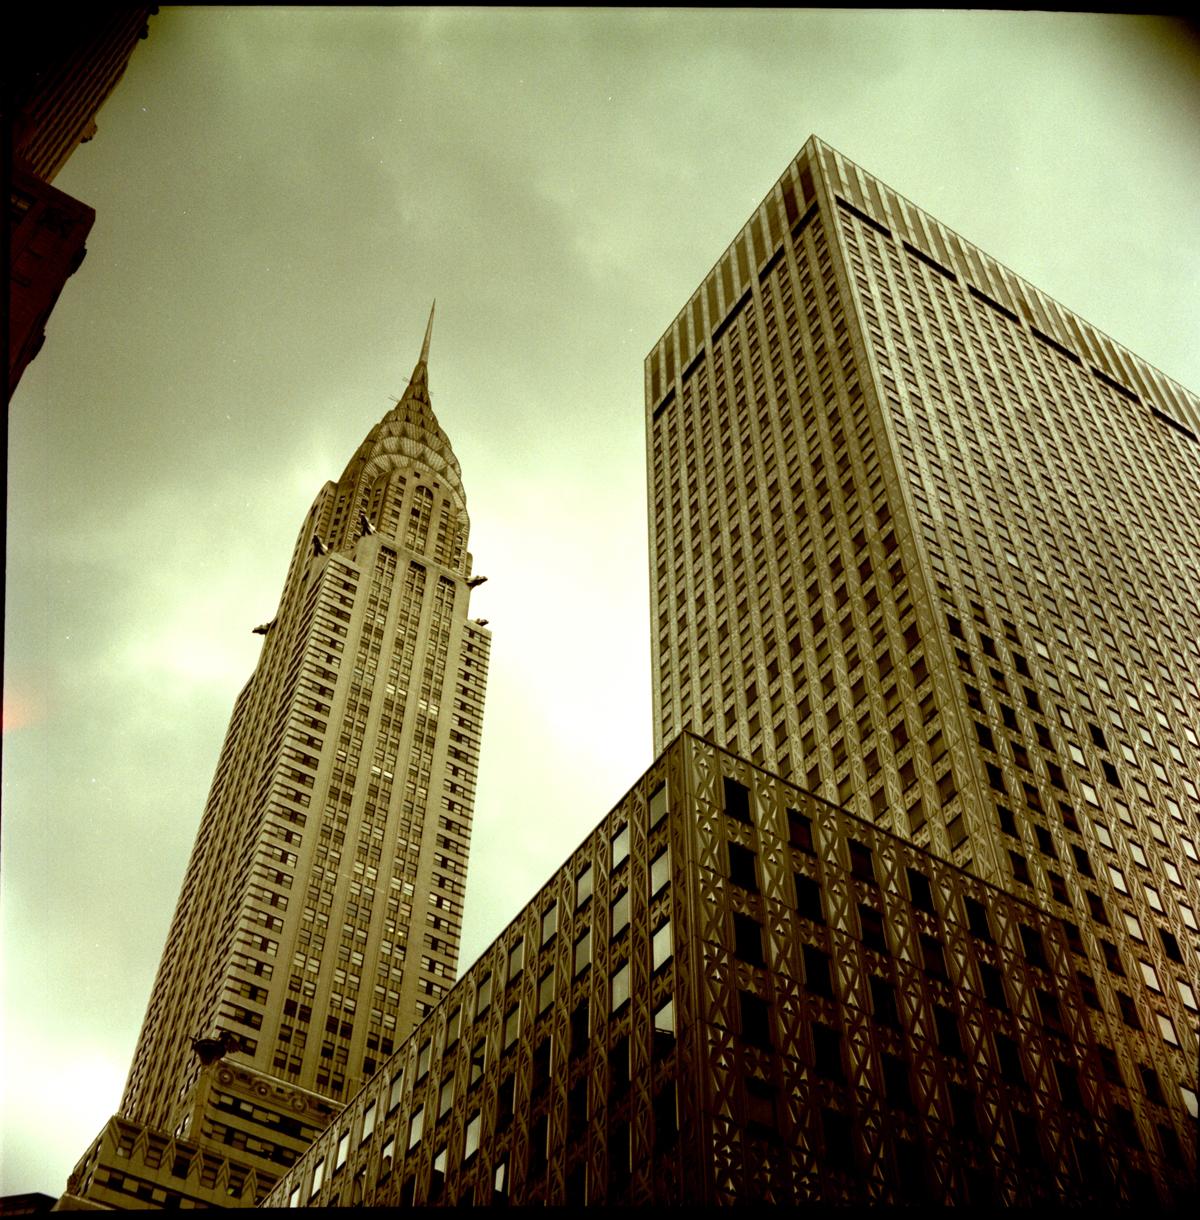 Chrysler Building, 42nd Street New York City